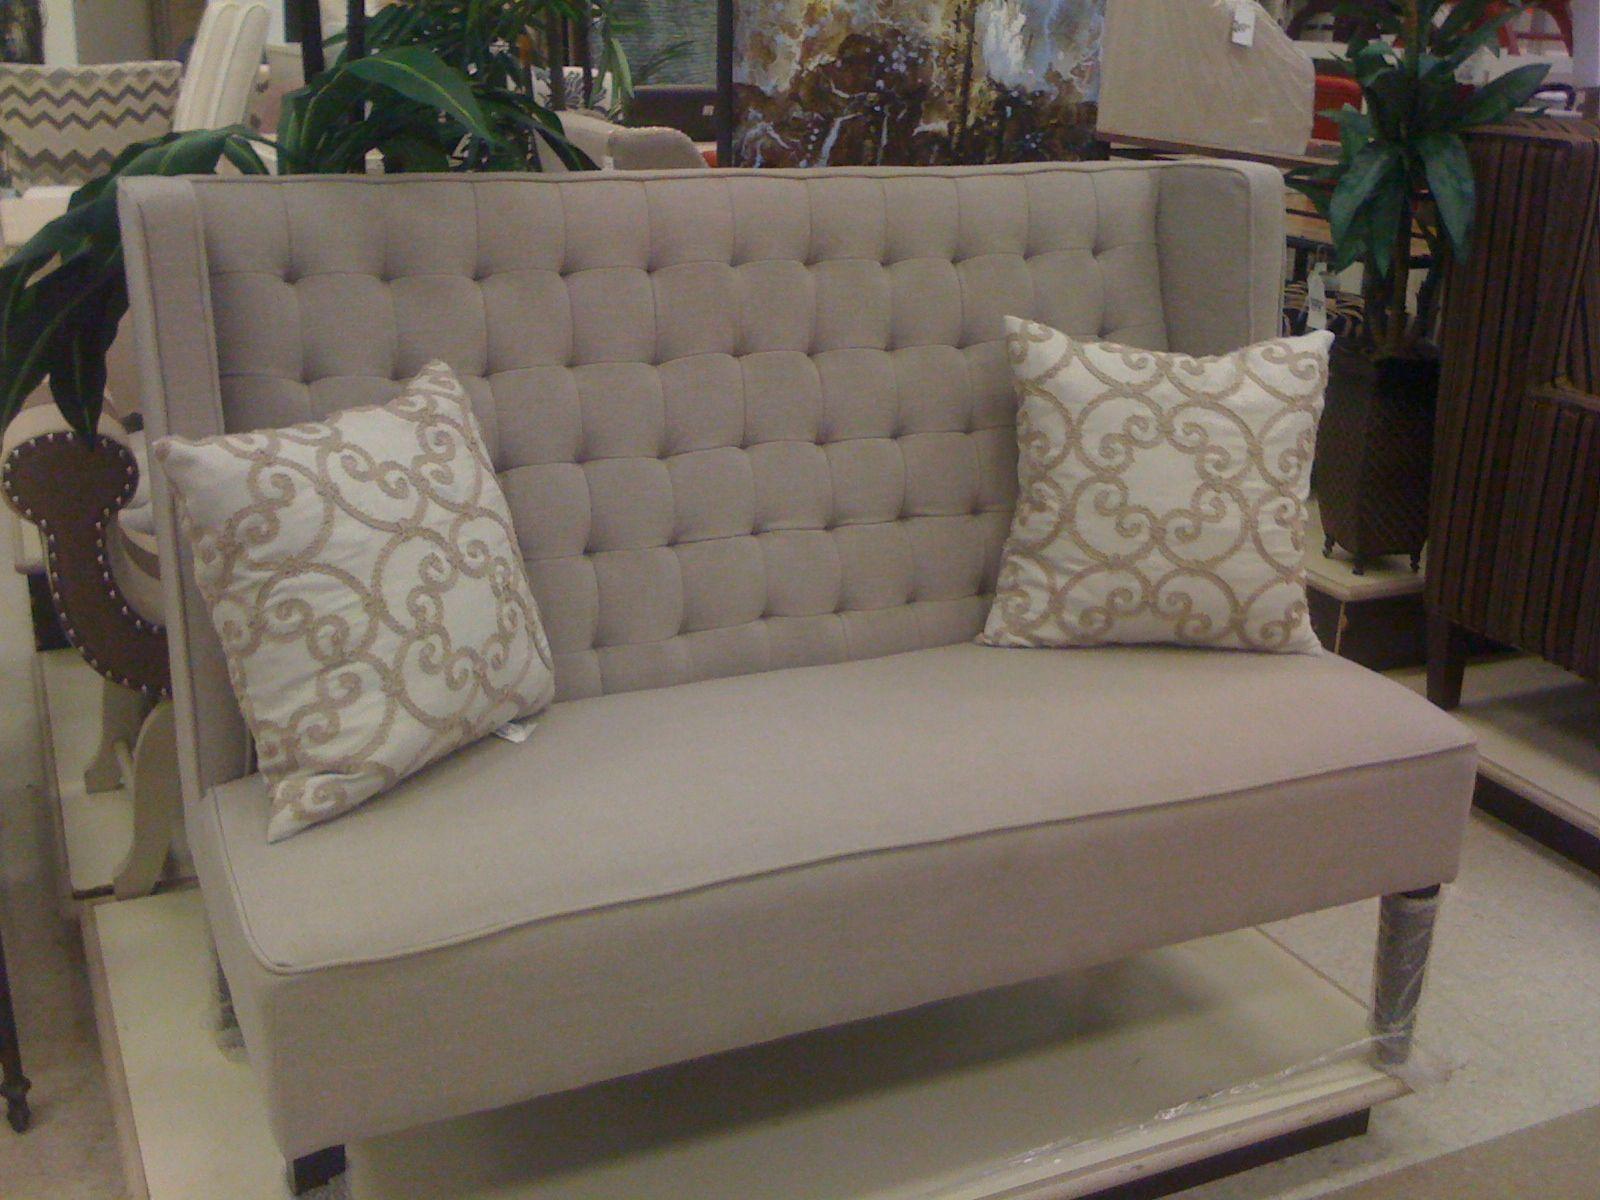 Grey Loveseat From Homesense | Love Seat, Home Decor, Grey Loveseat